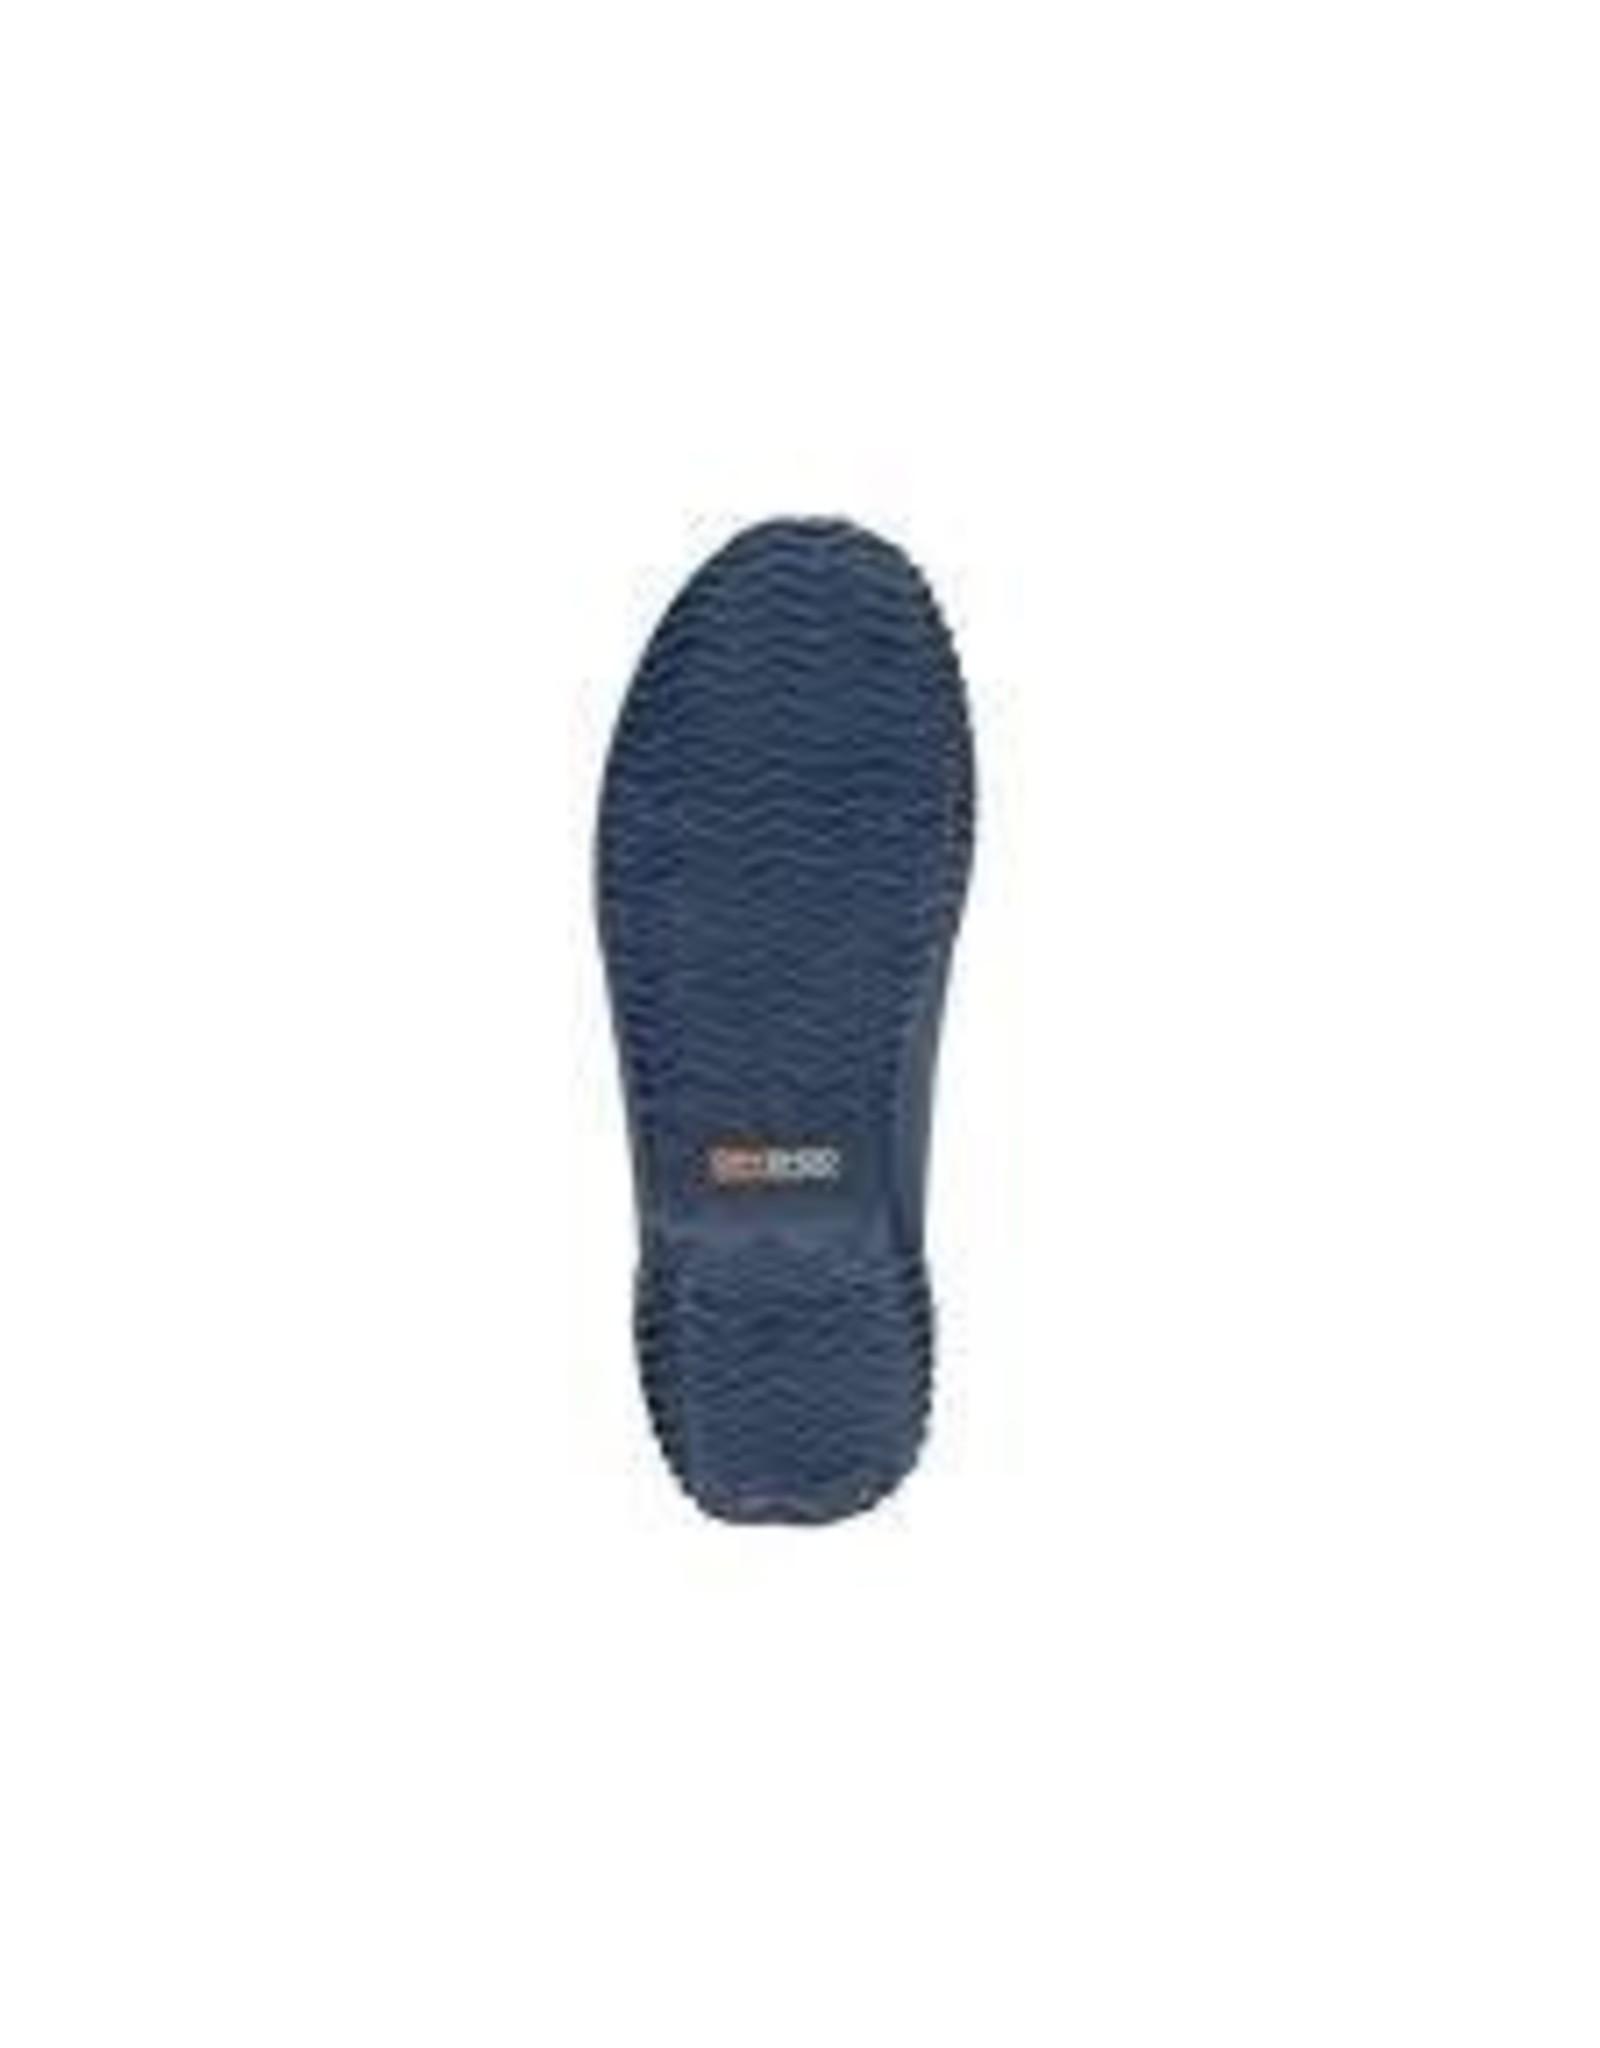 Boots-Women DryShod SDB-WS Sod Buster Garden Shoe